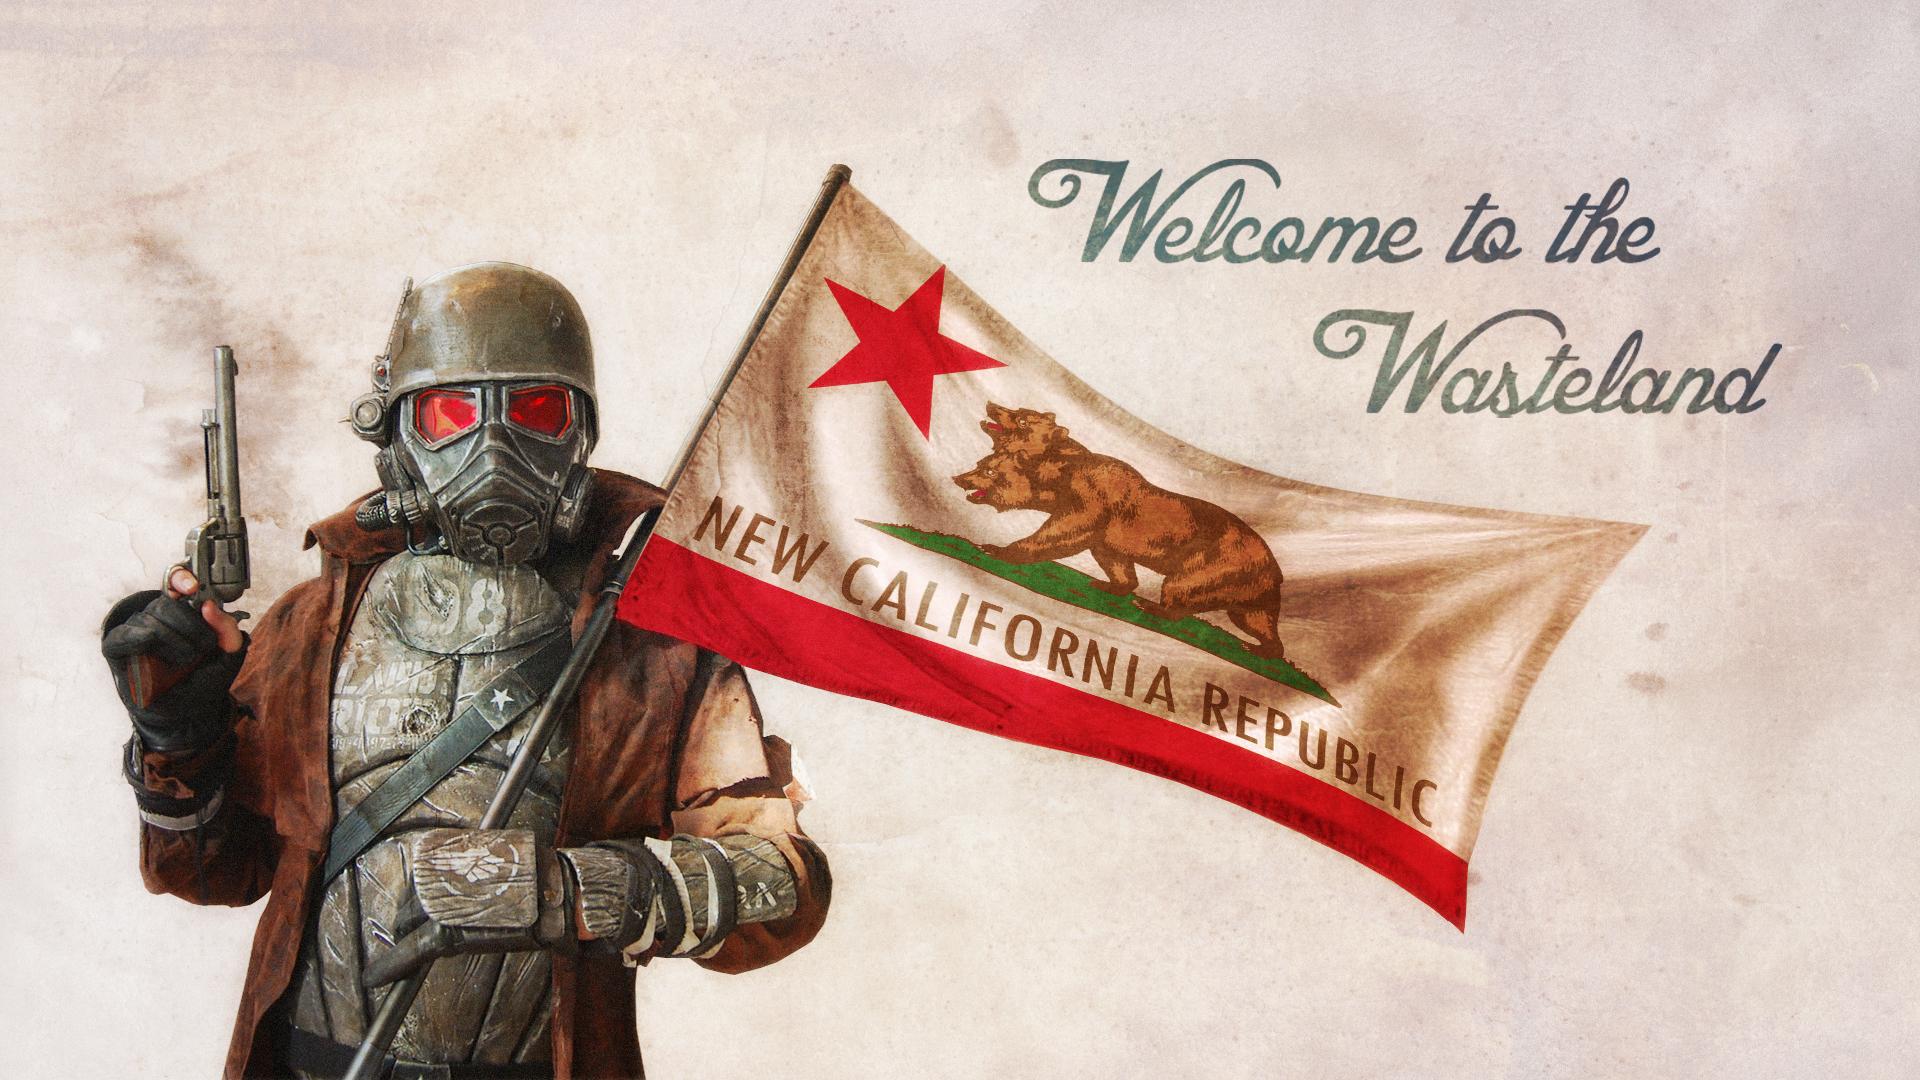 New California Rebublic HD Wallpaper